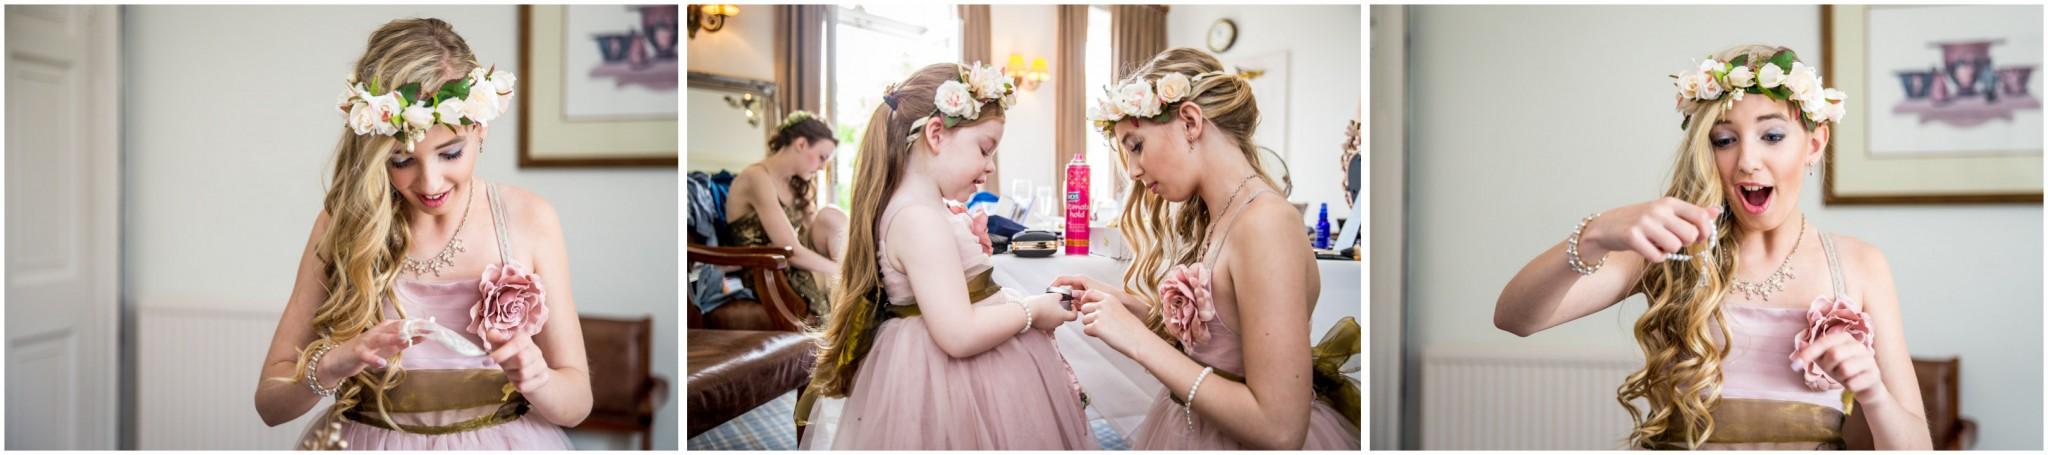 Highfield Park Wedding Photography Bridesmaids opening gifts